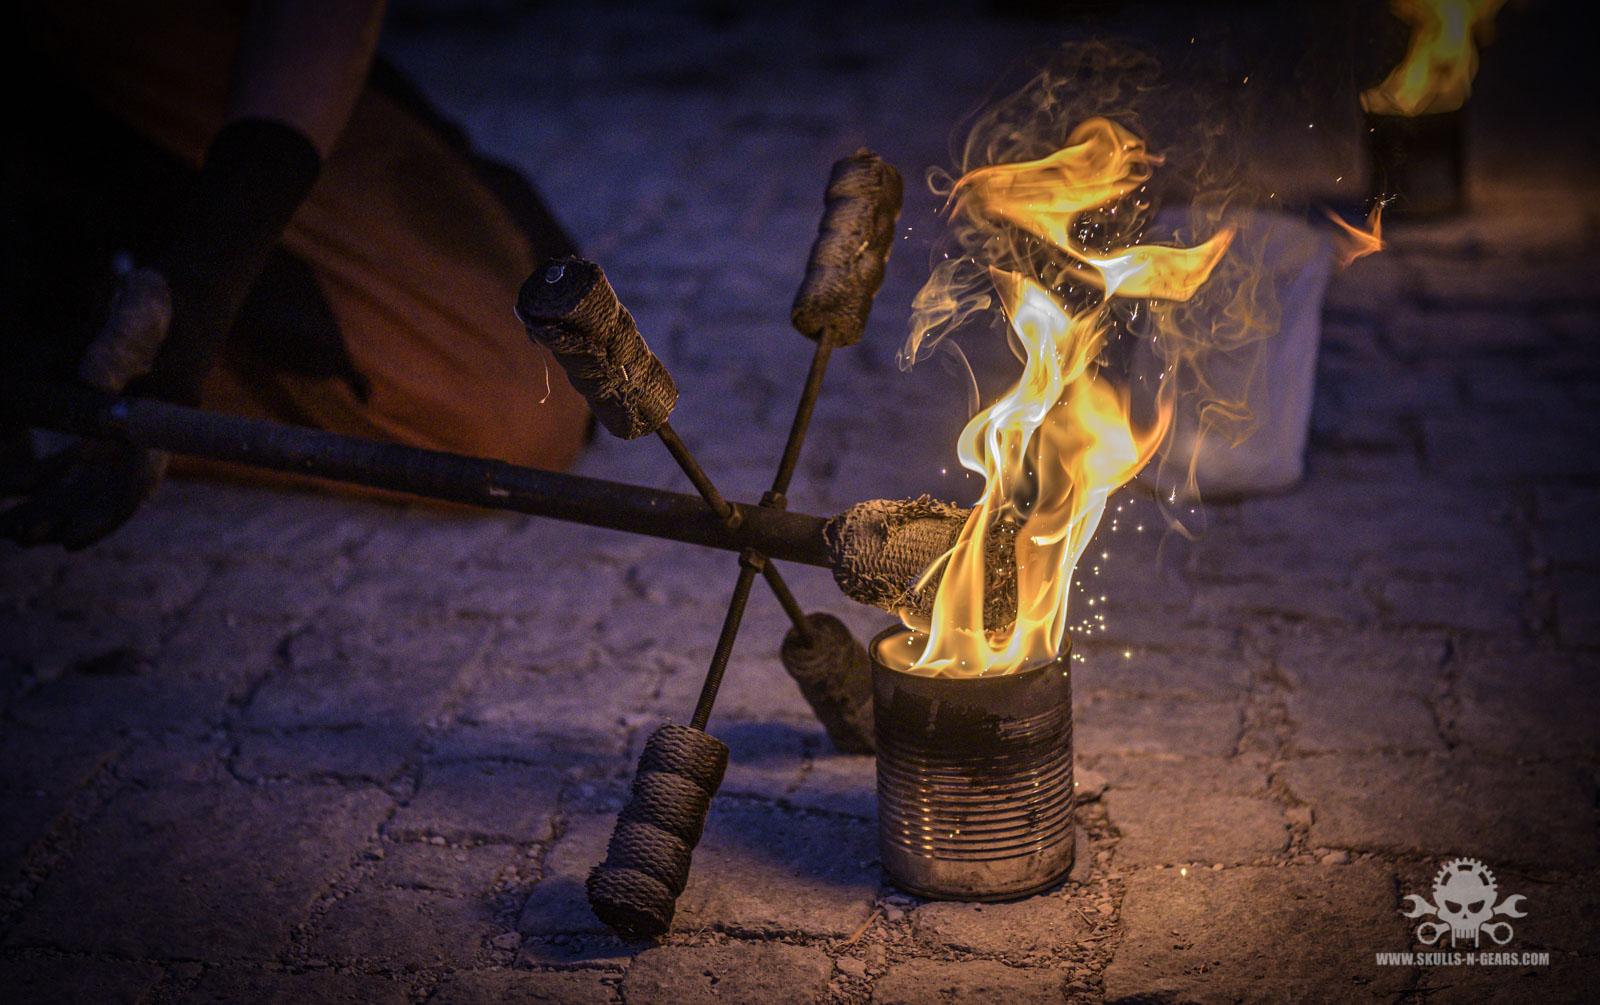 Feuertanz Festival 2019 - Feuershow-1229